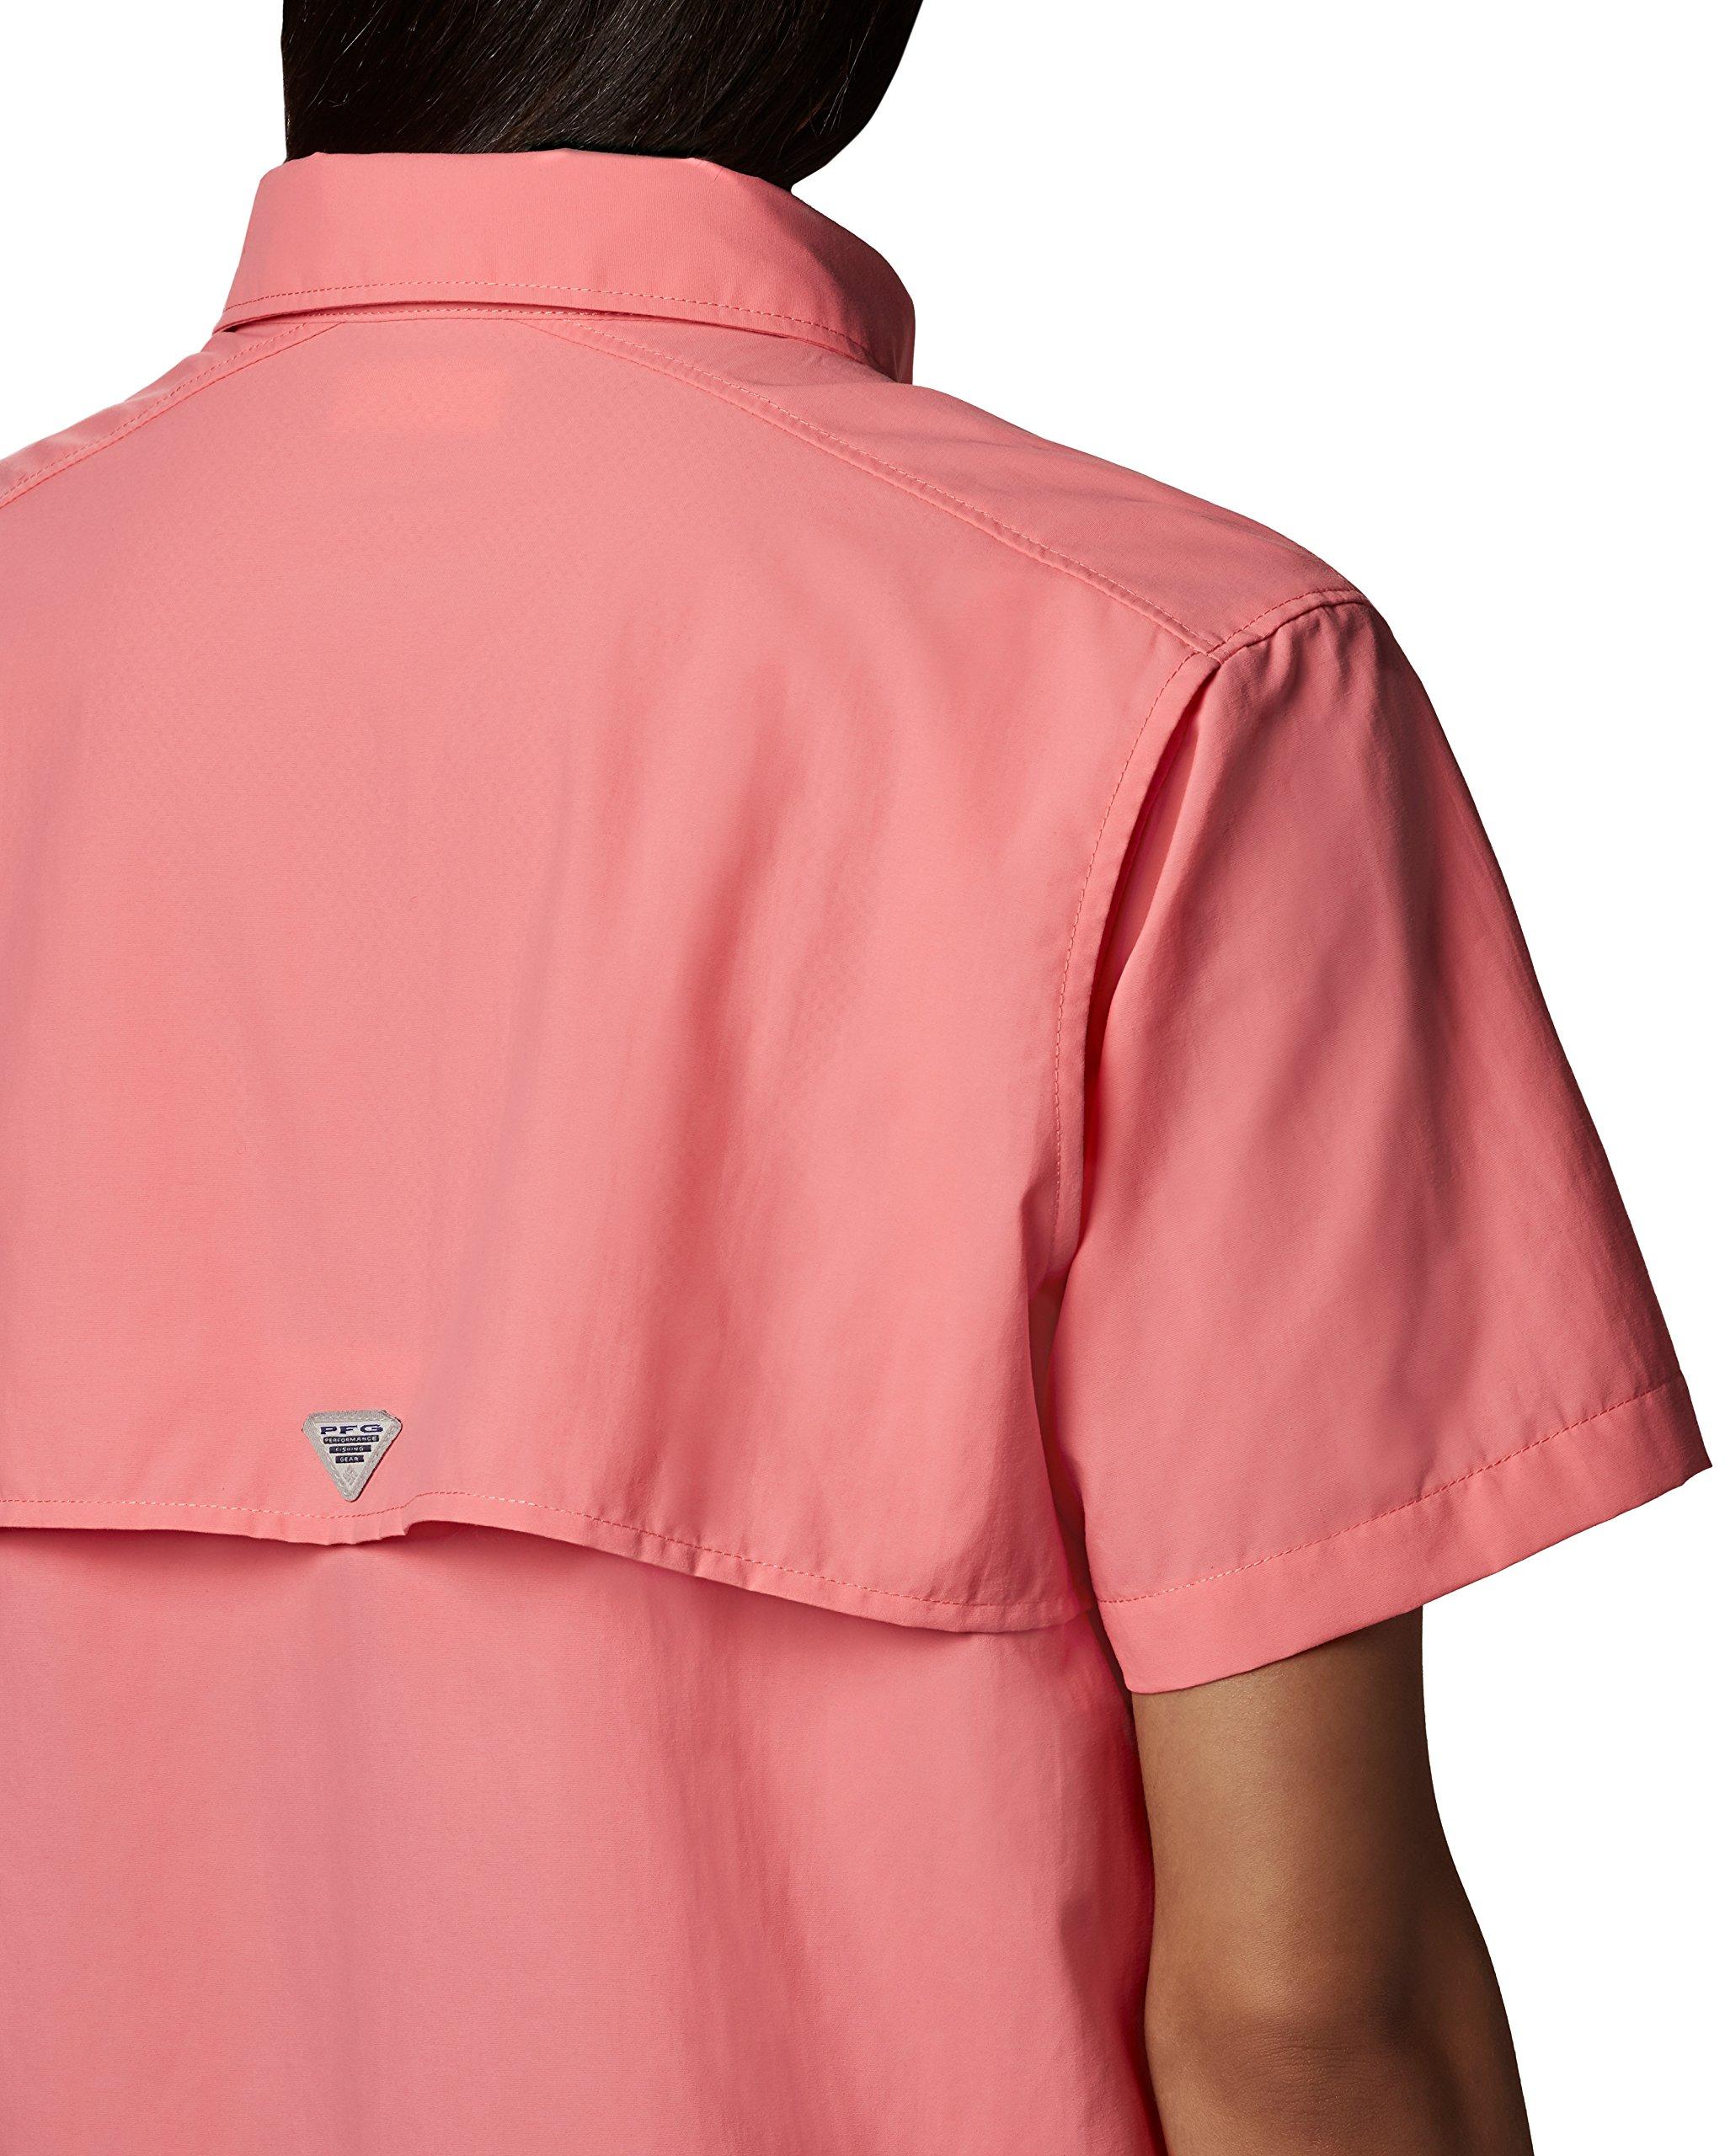 Columbia Women's Bahama Short Sleeve, Lollipop, X-Large by Columbia (Image #5)